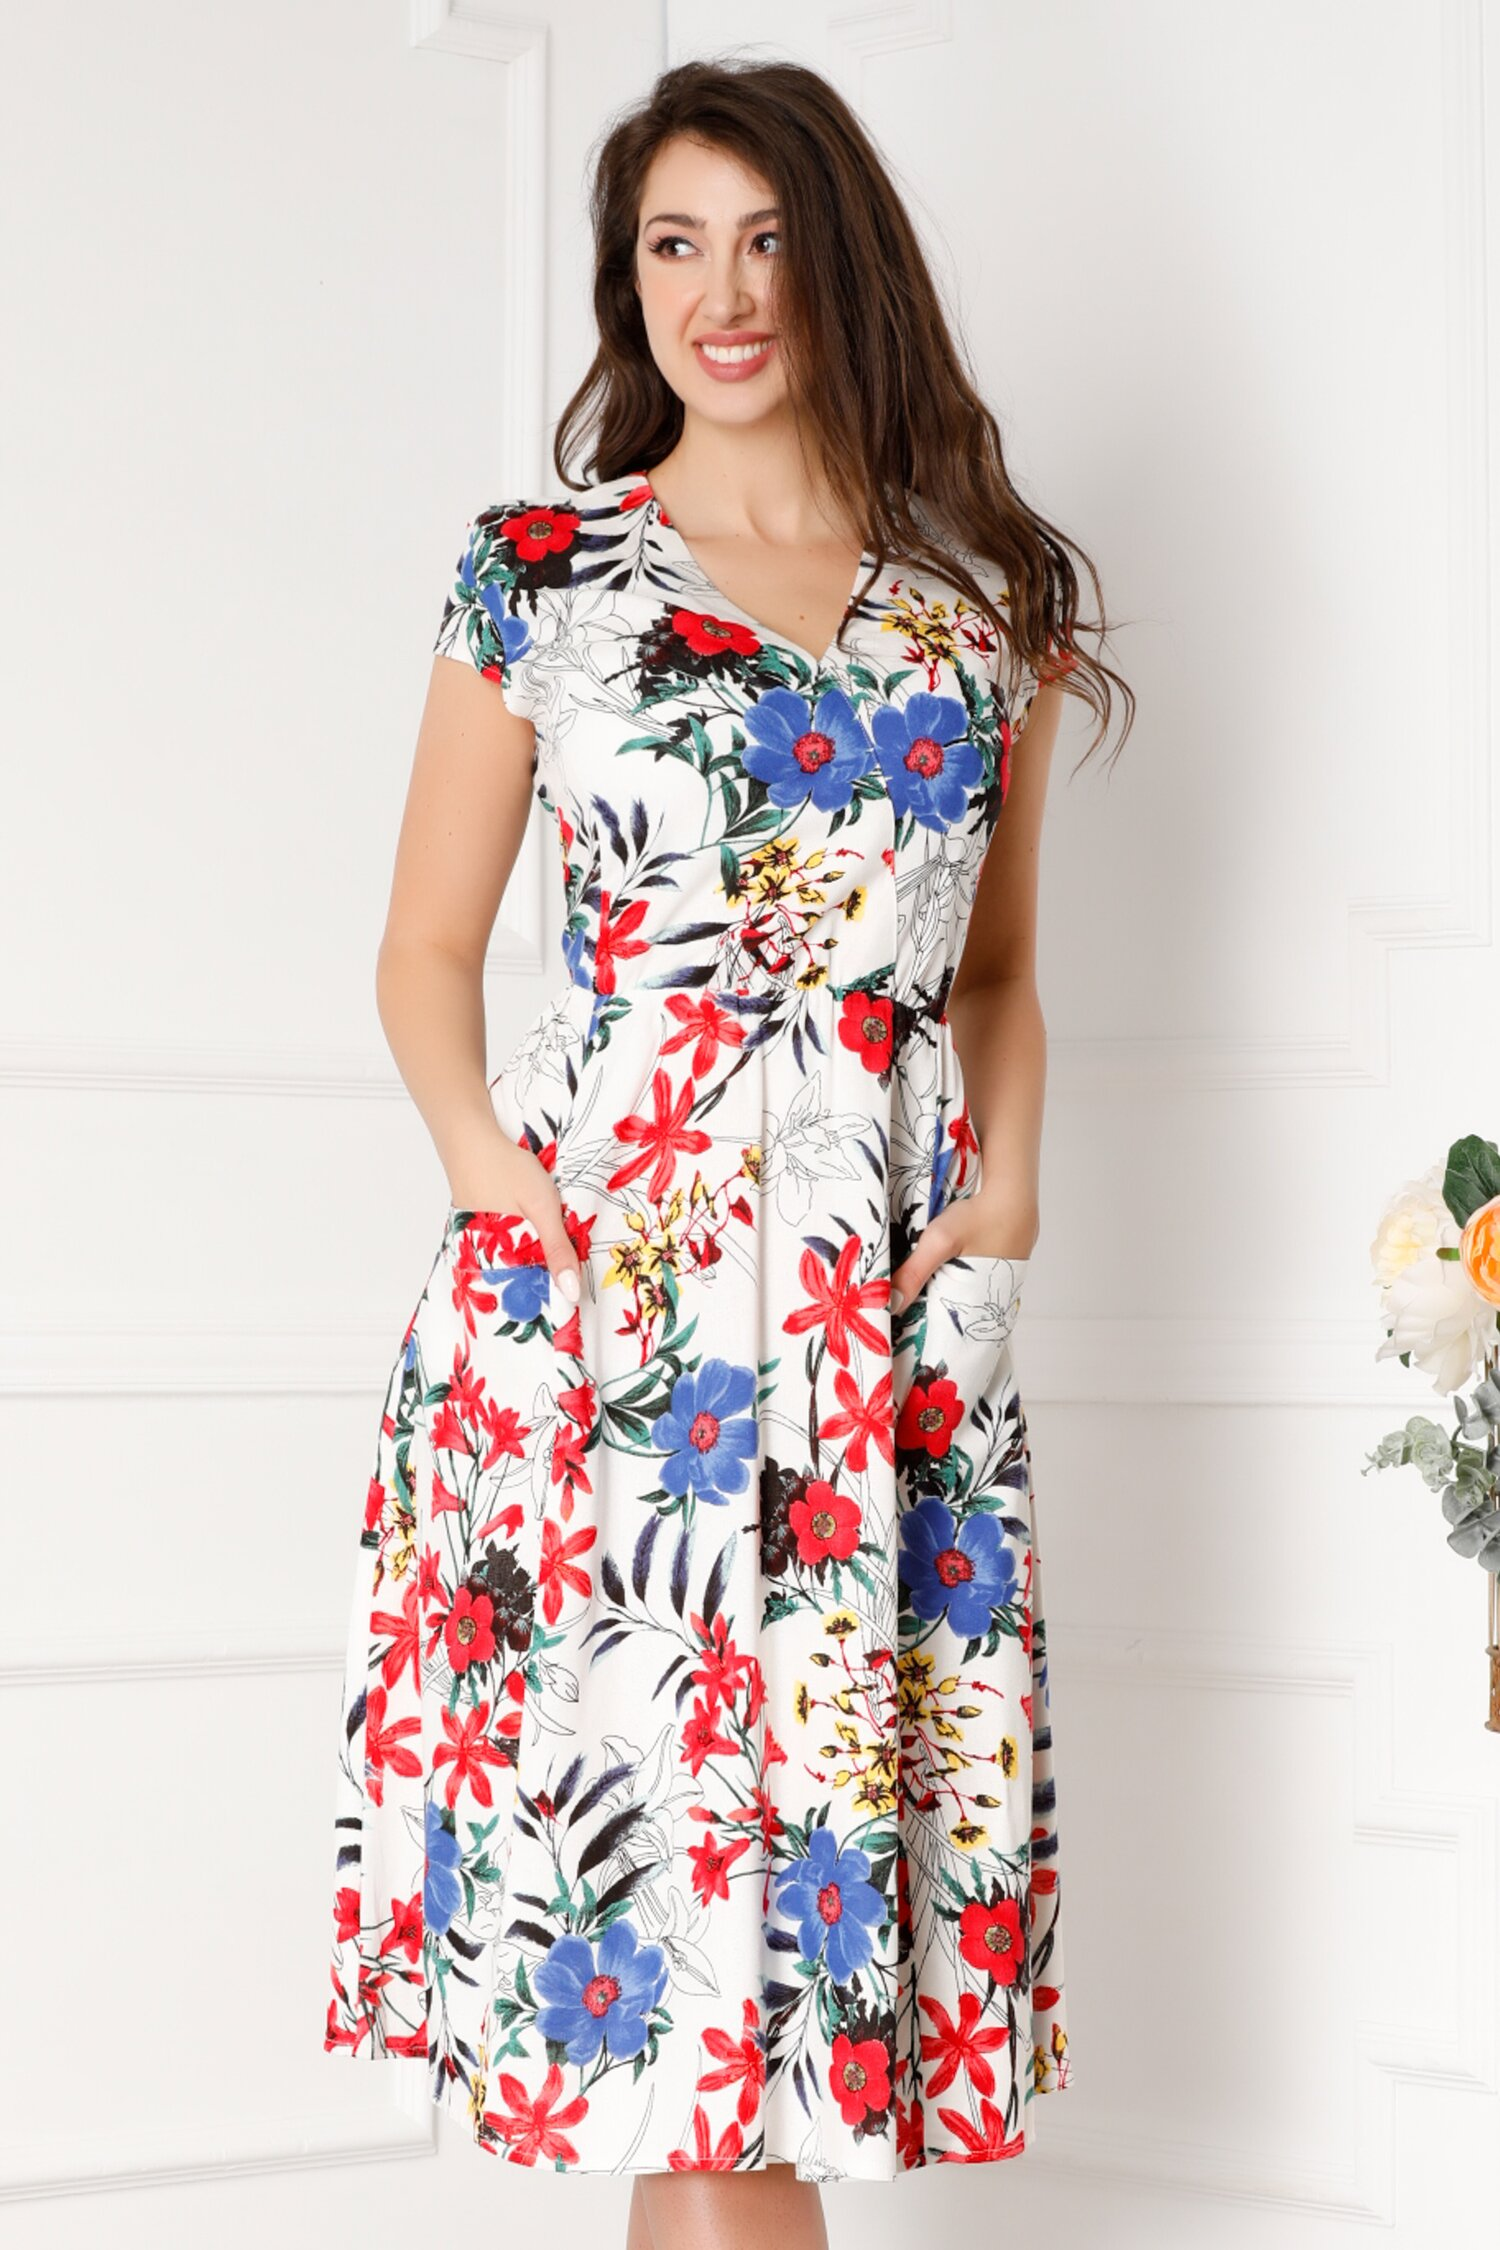 Rochie Misha alba cu imprimeuri florale colorate